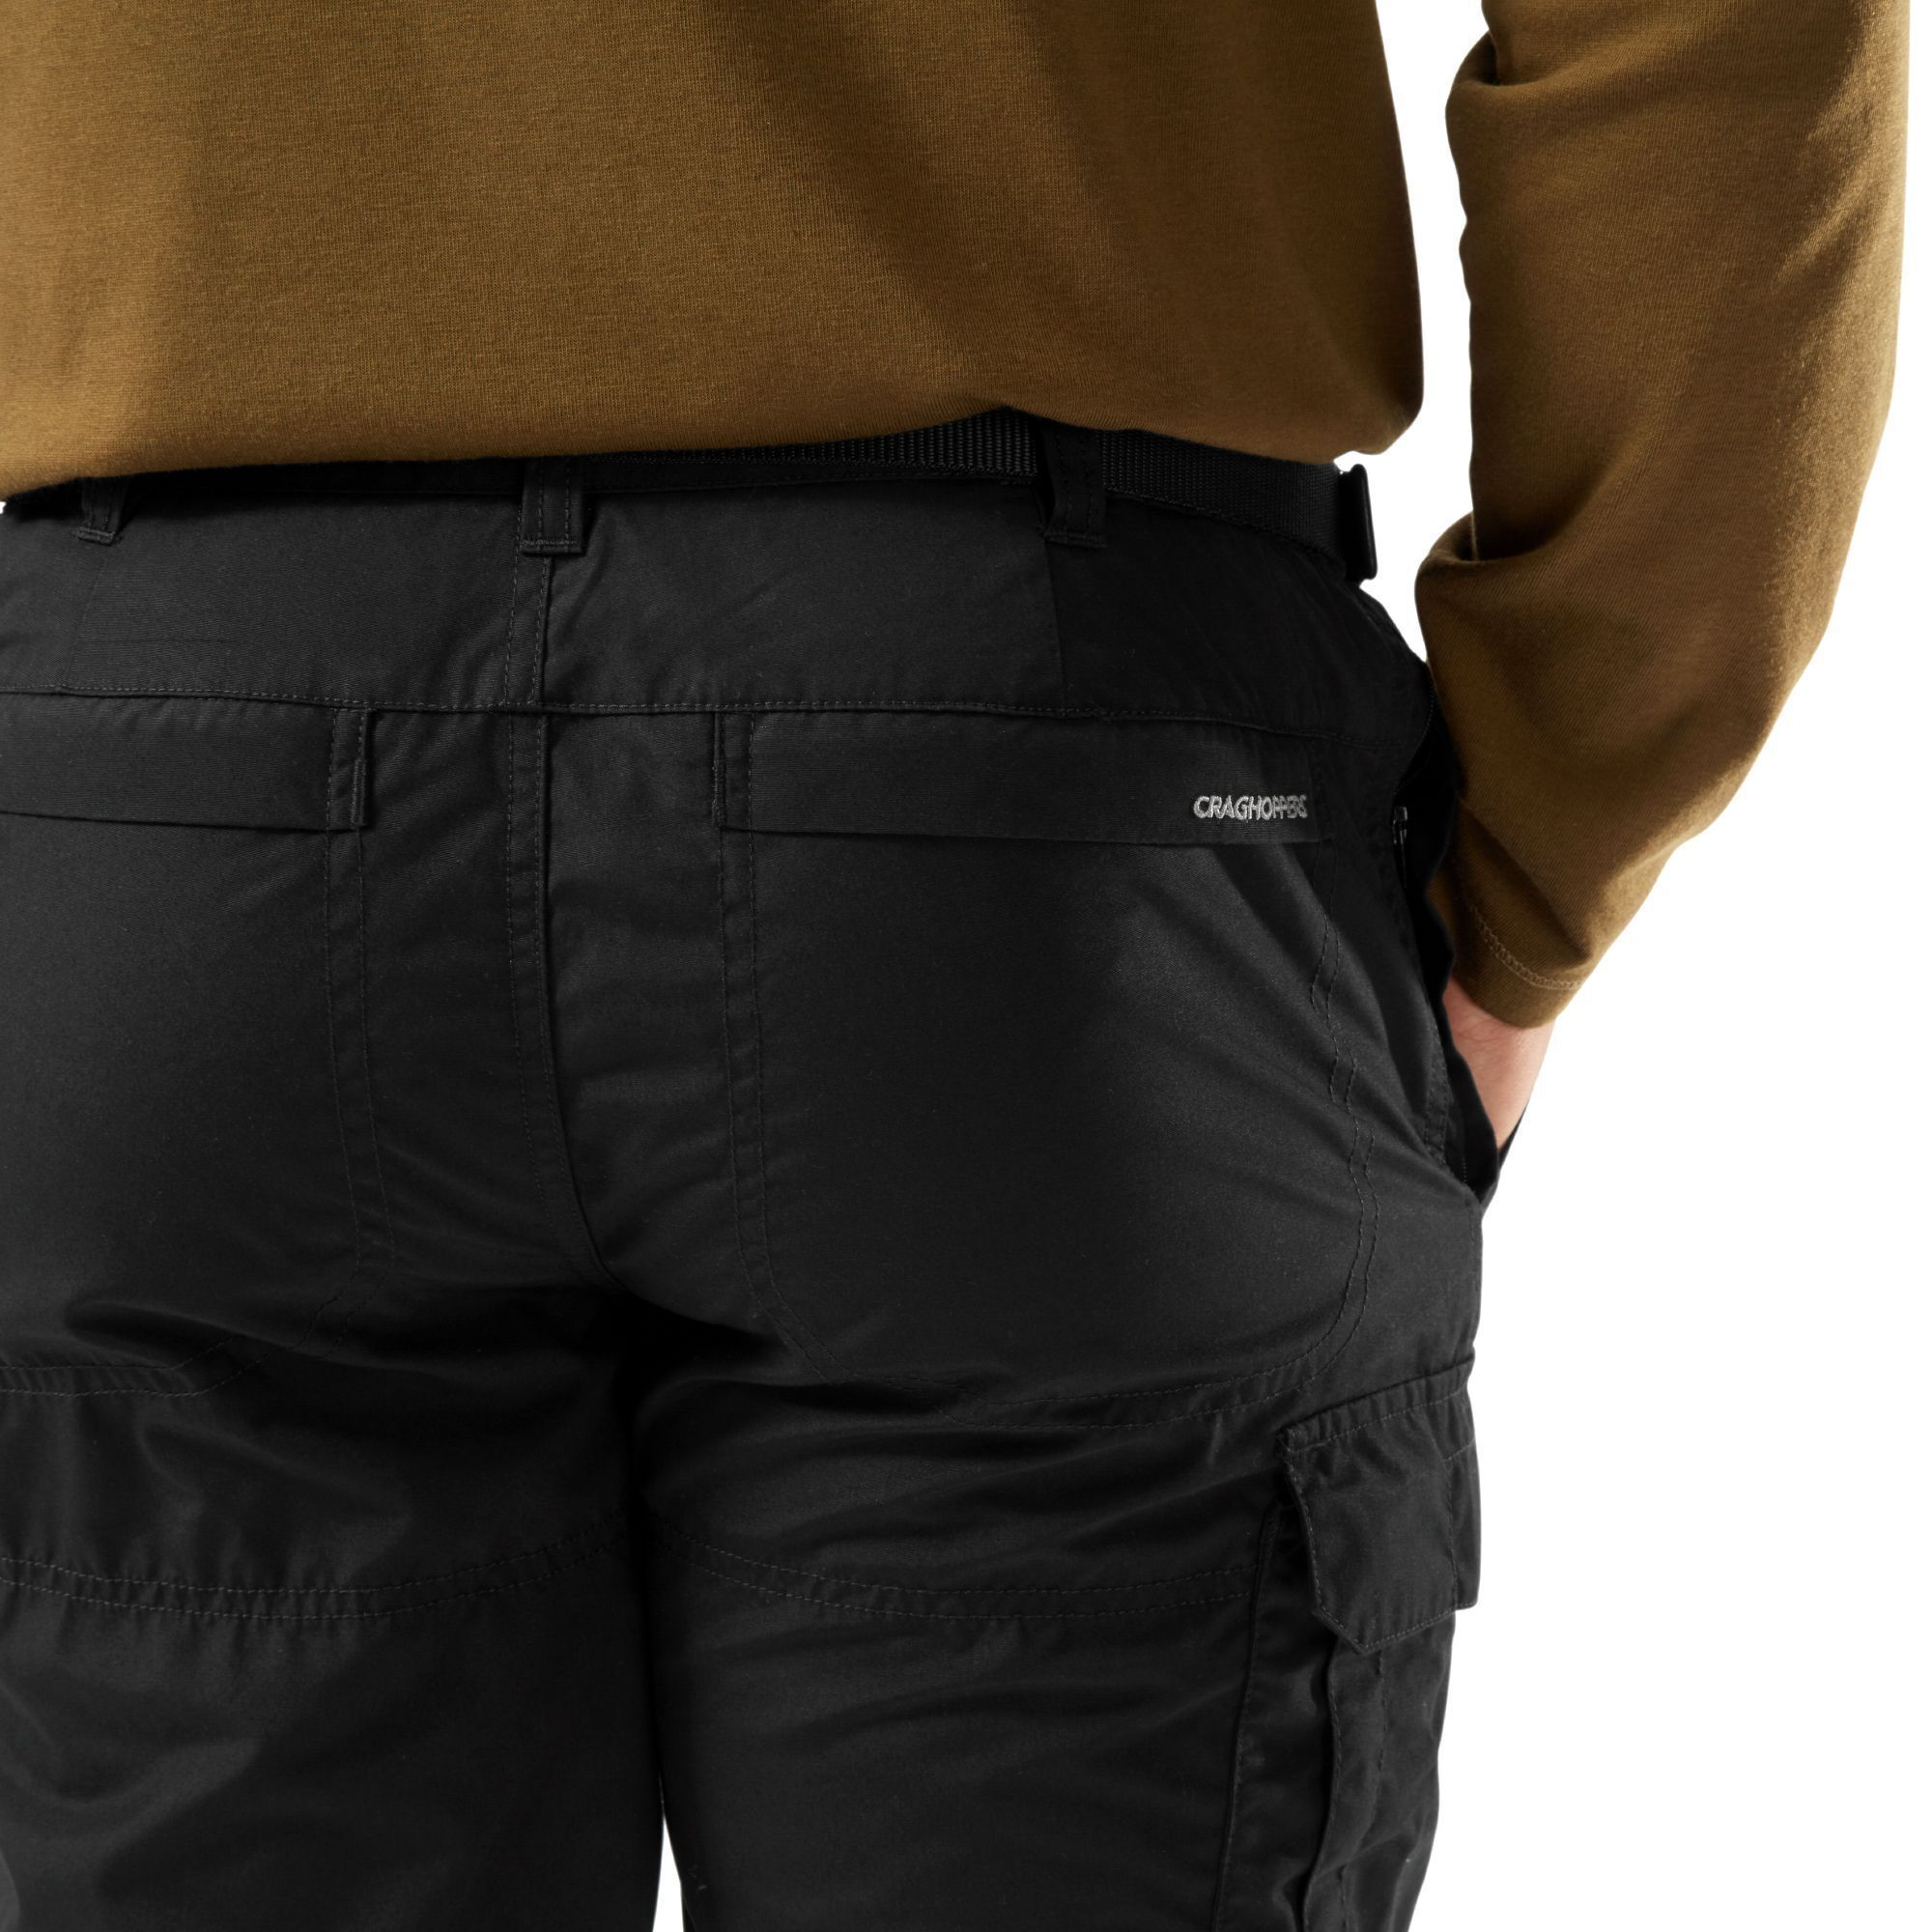 Craghoppers Mens Kiwi Slim Trousers (Black)